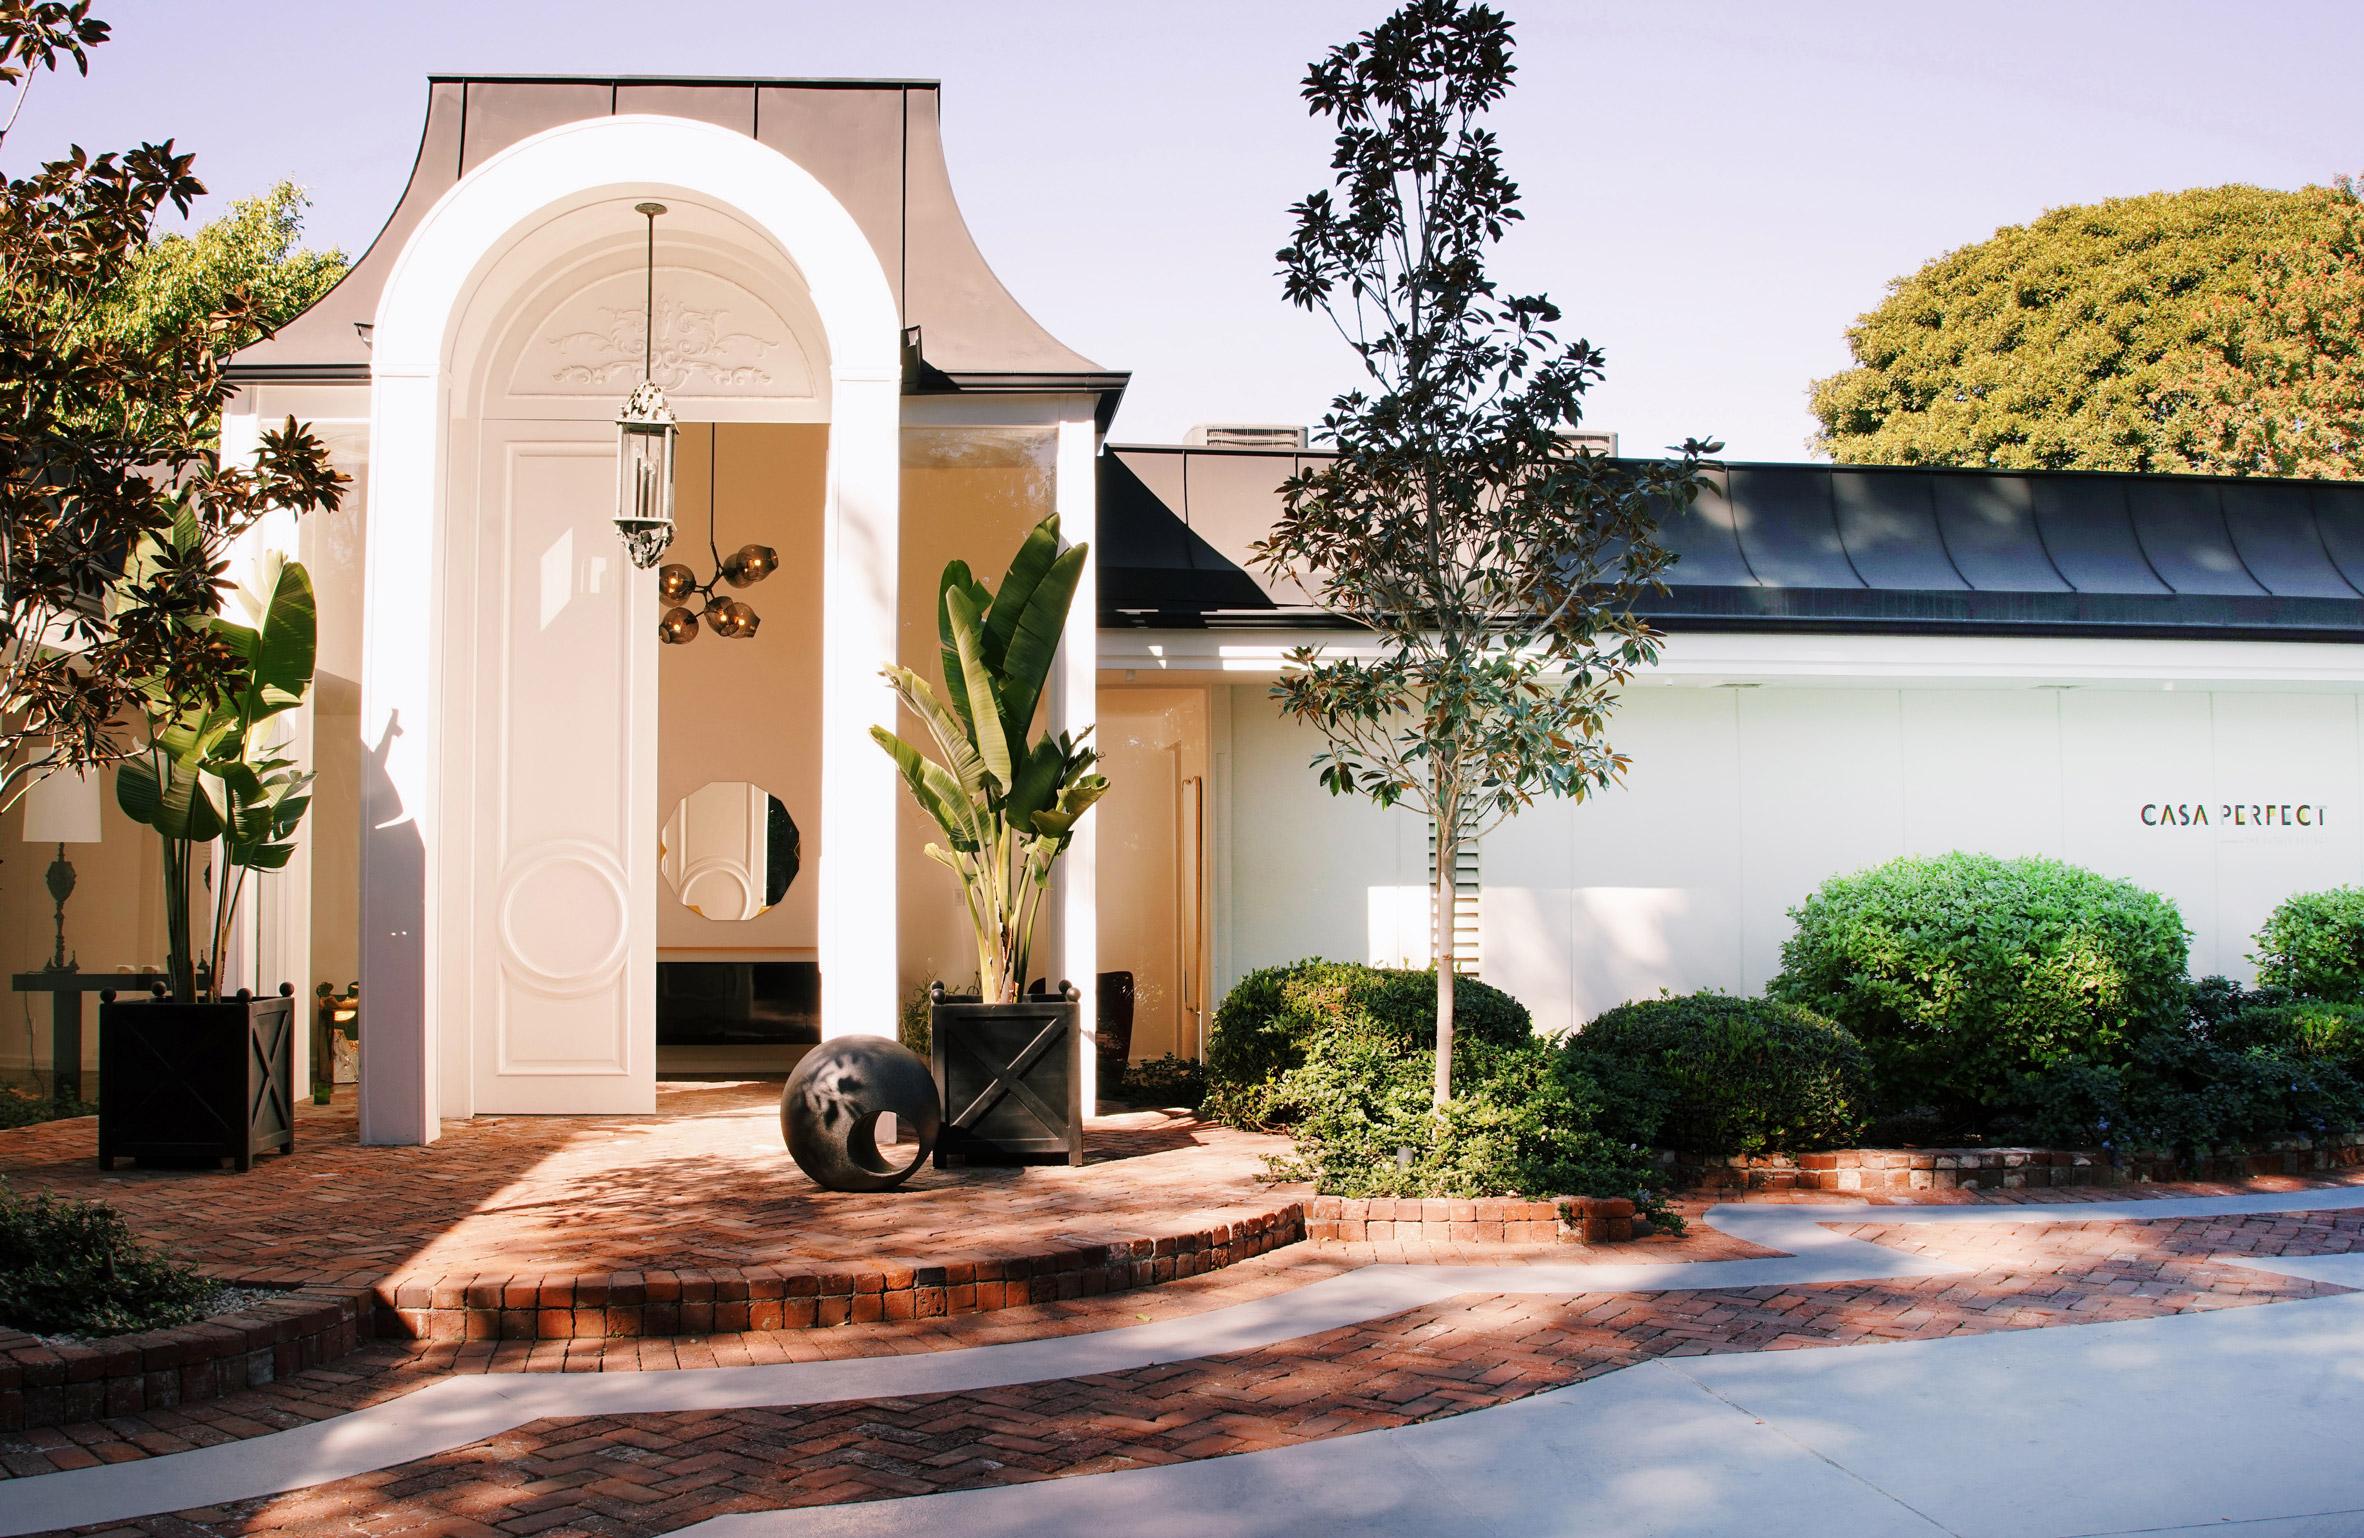 Casa Perfect showroom opens in Elvis Presley's former Los Angeles home